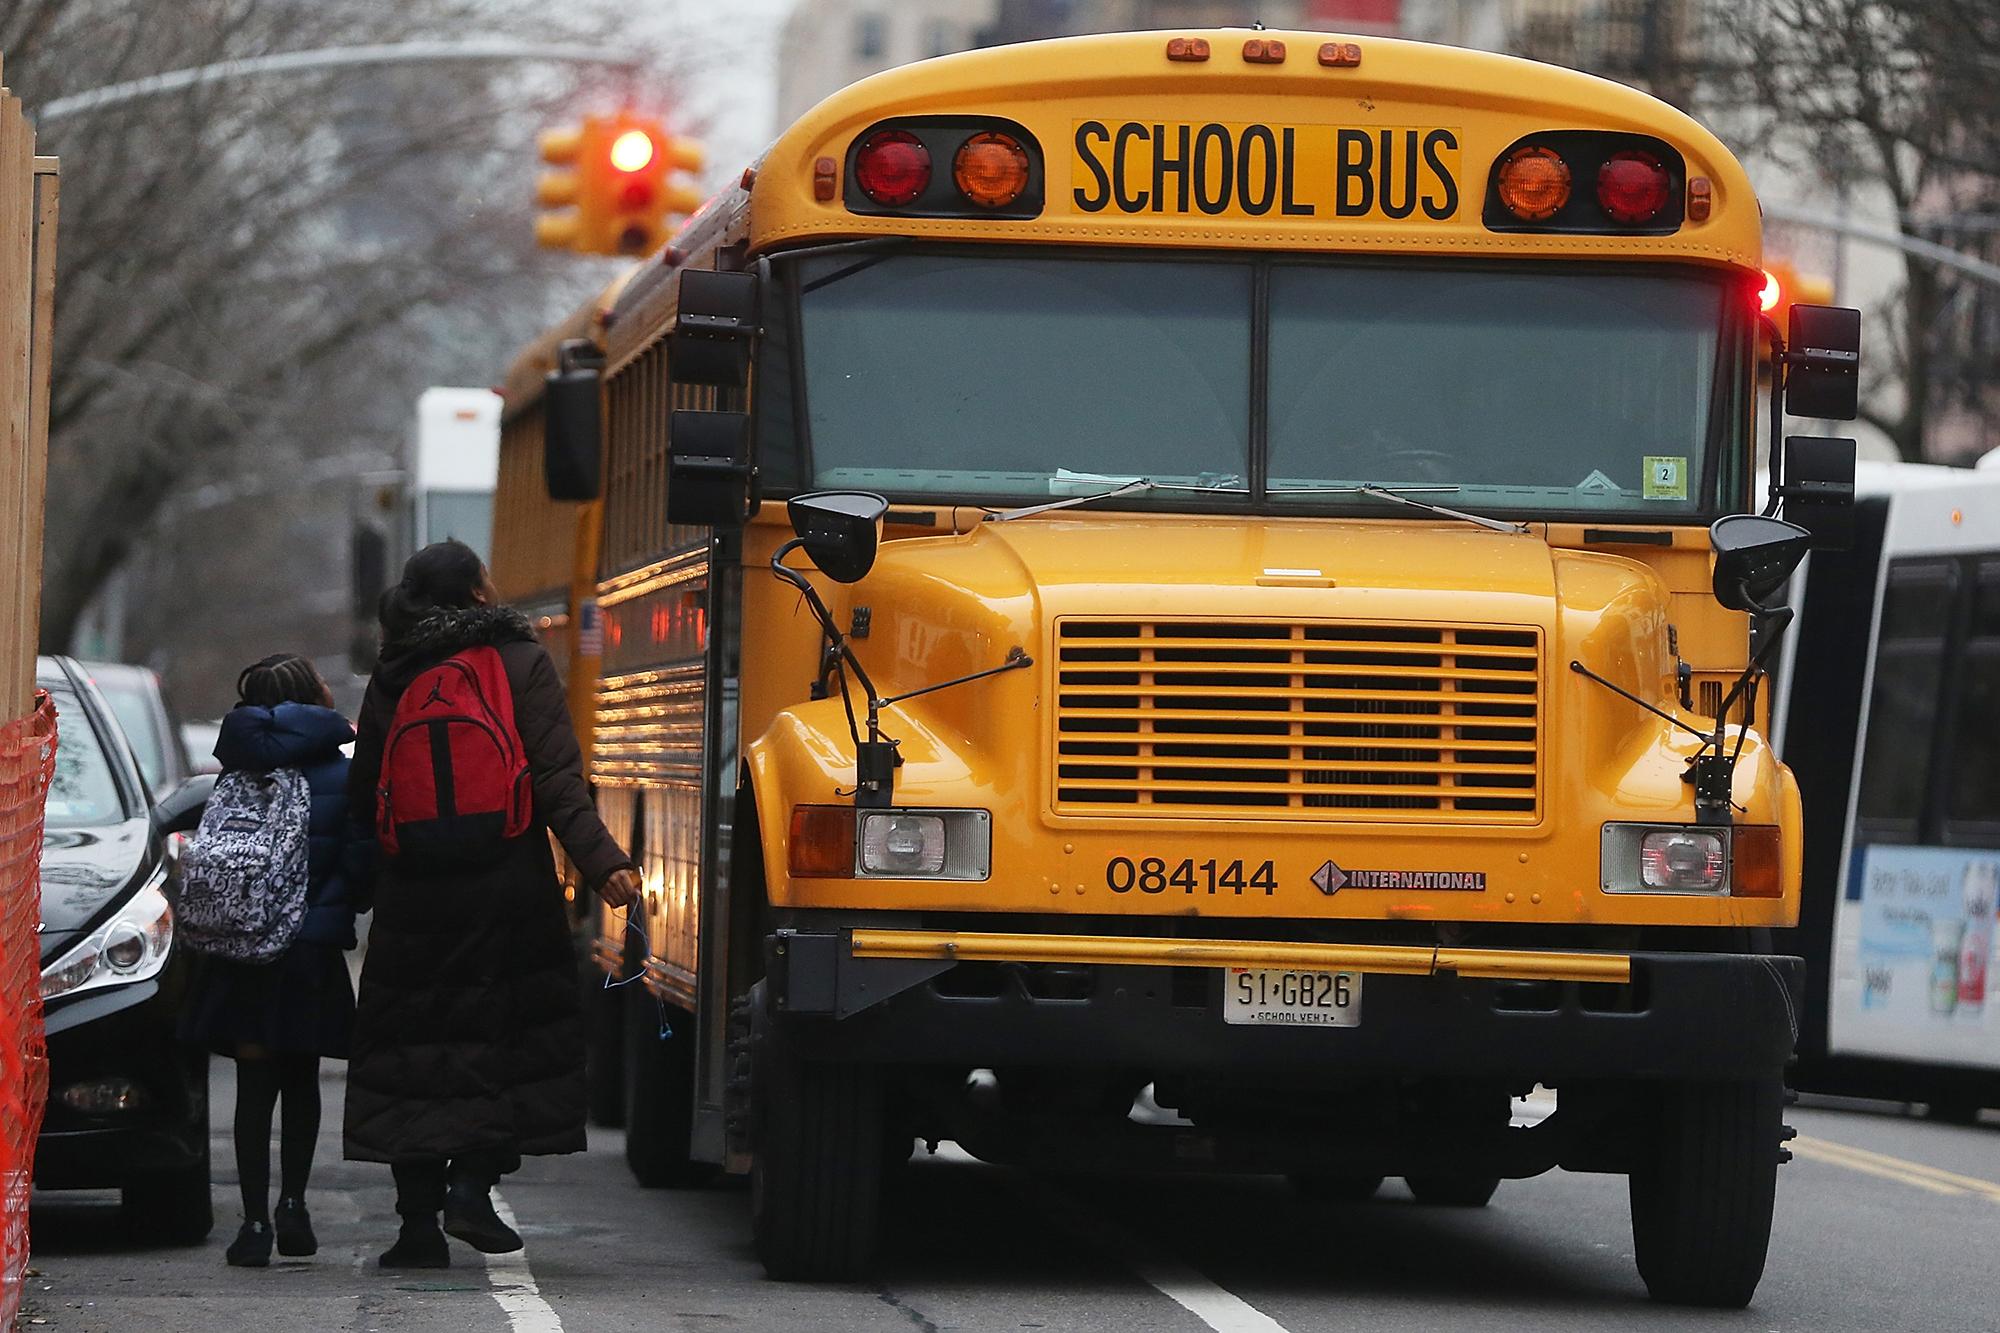 Schools buses